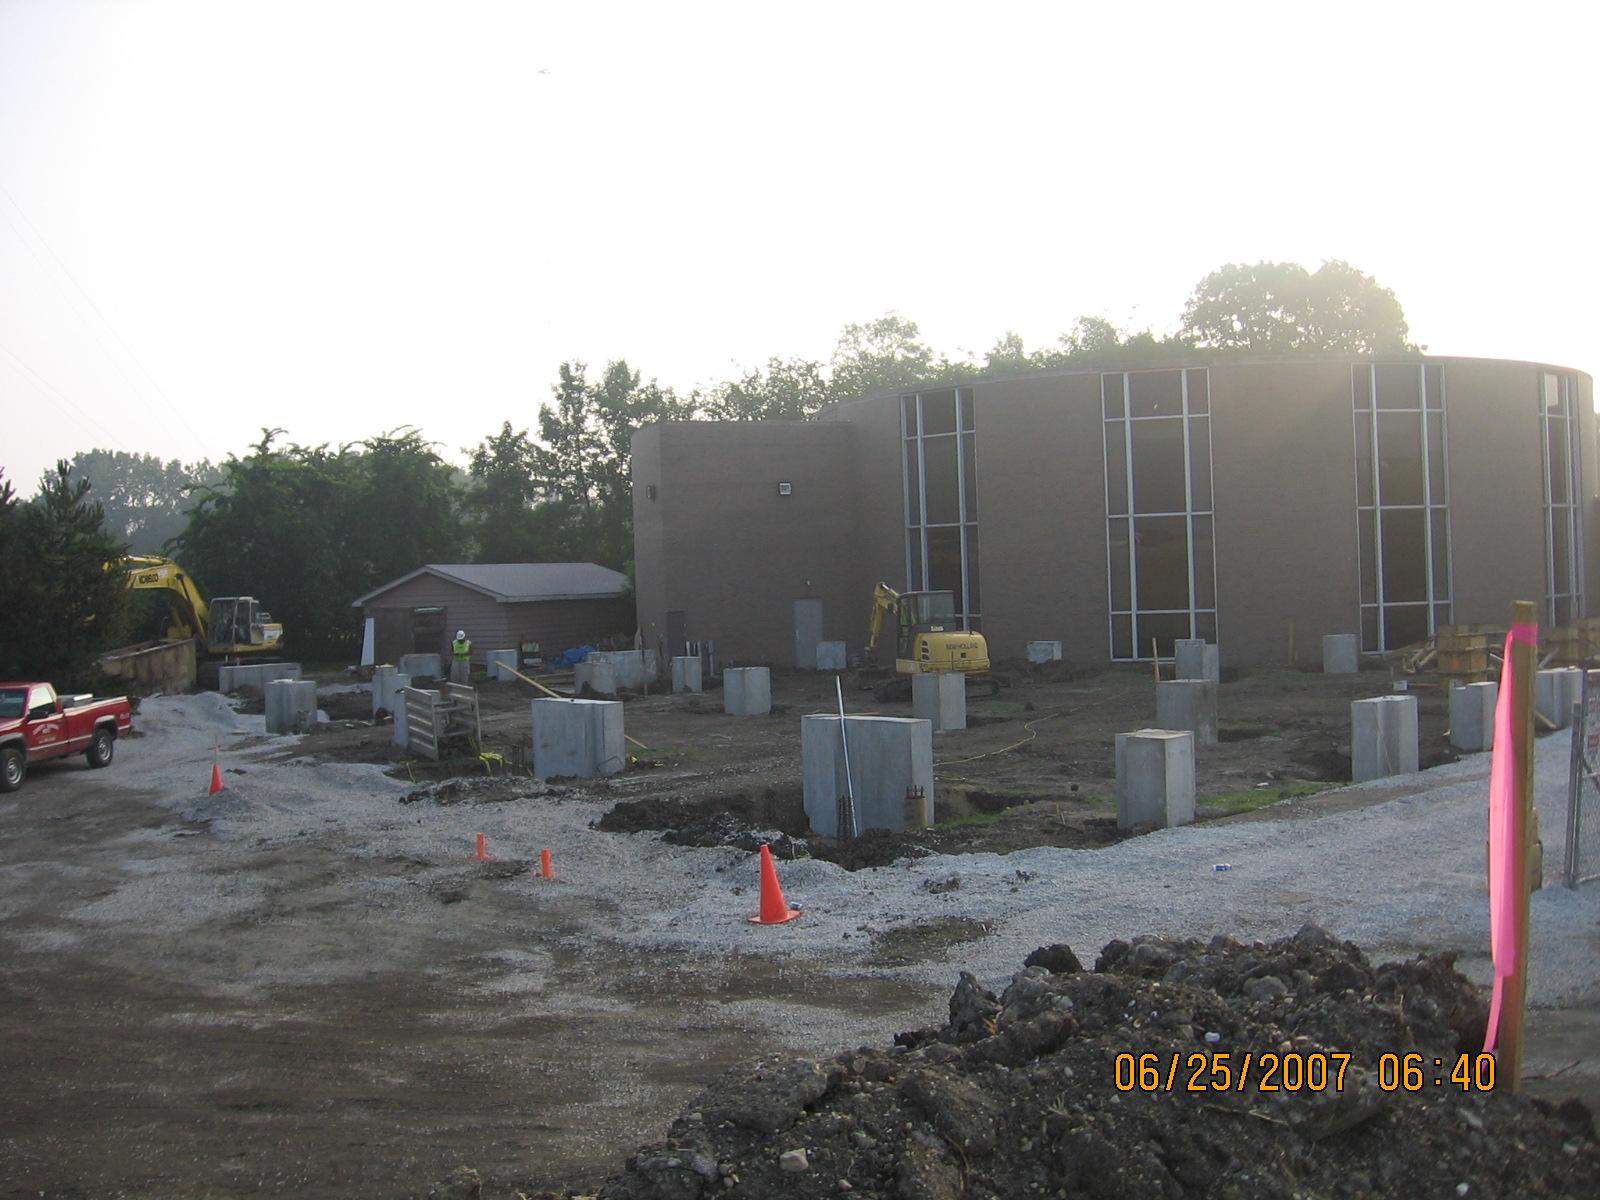 2007, June 29